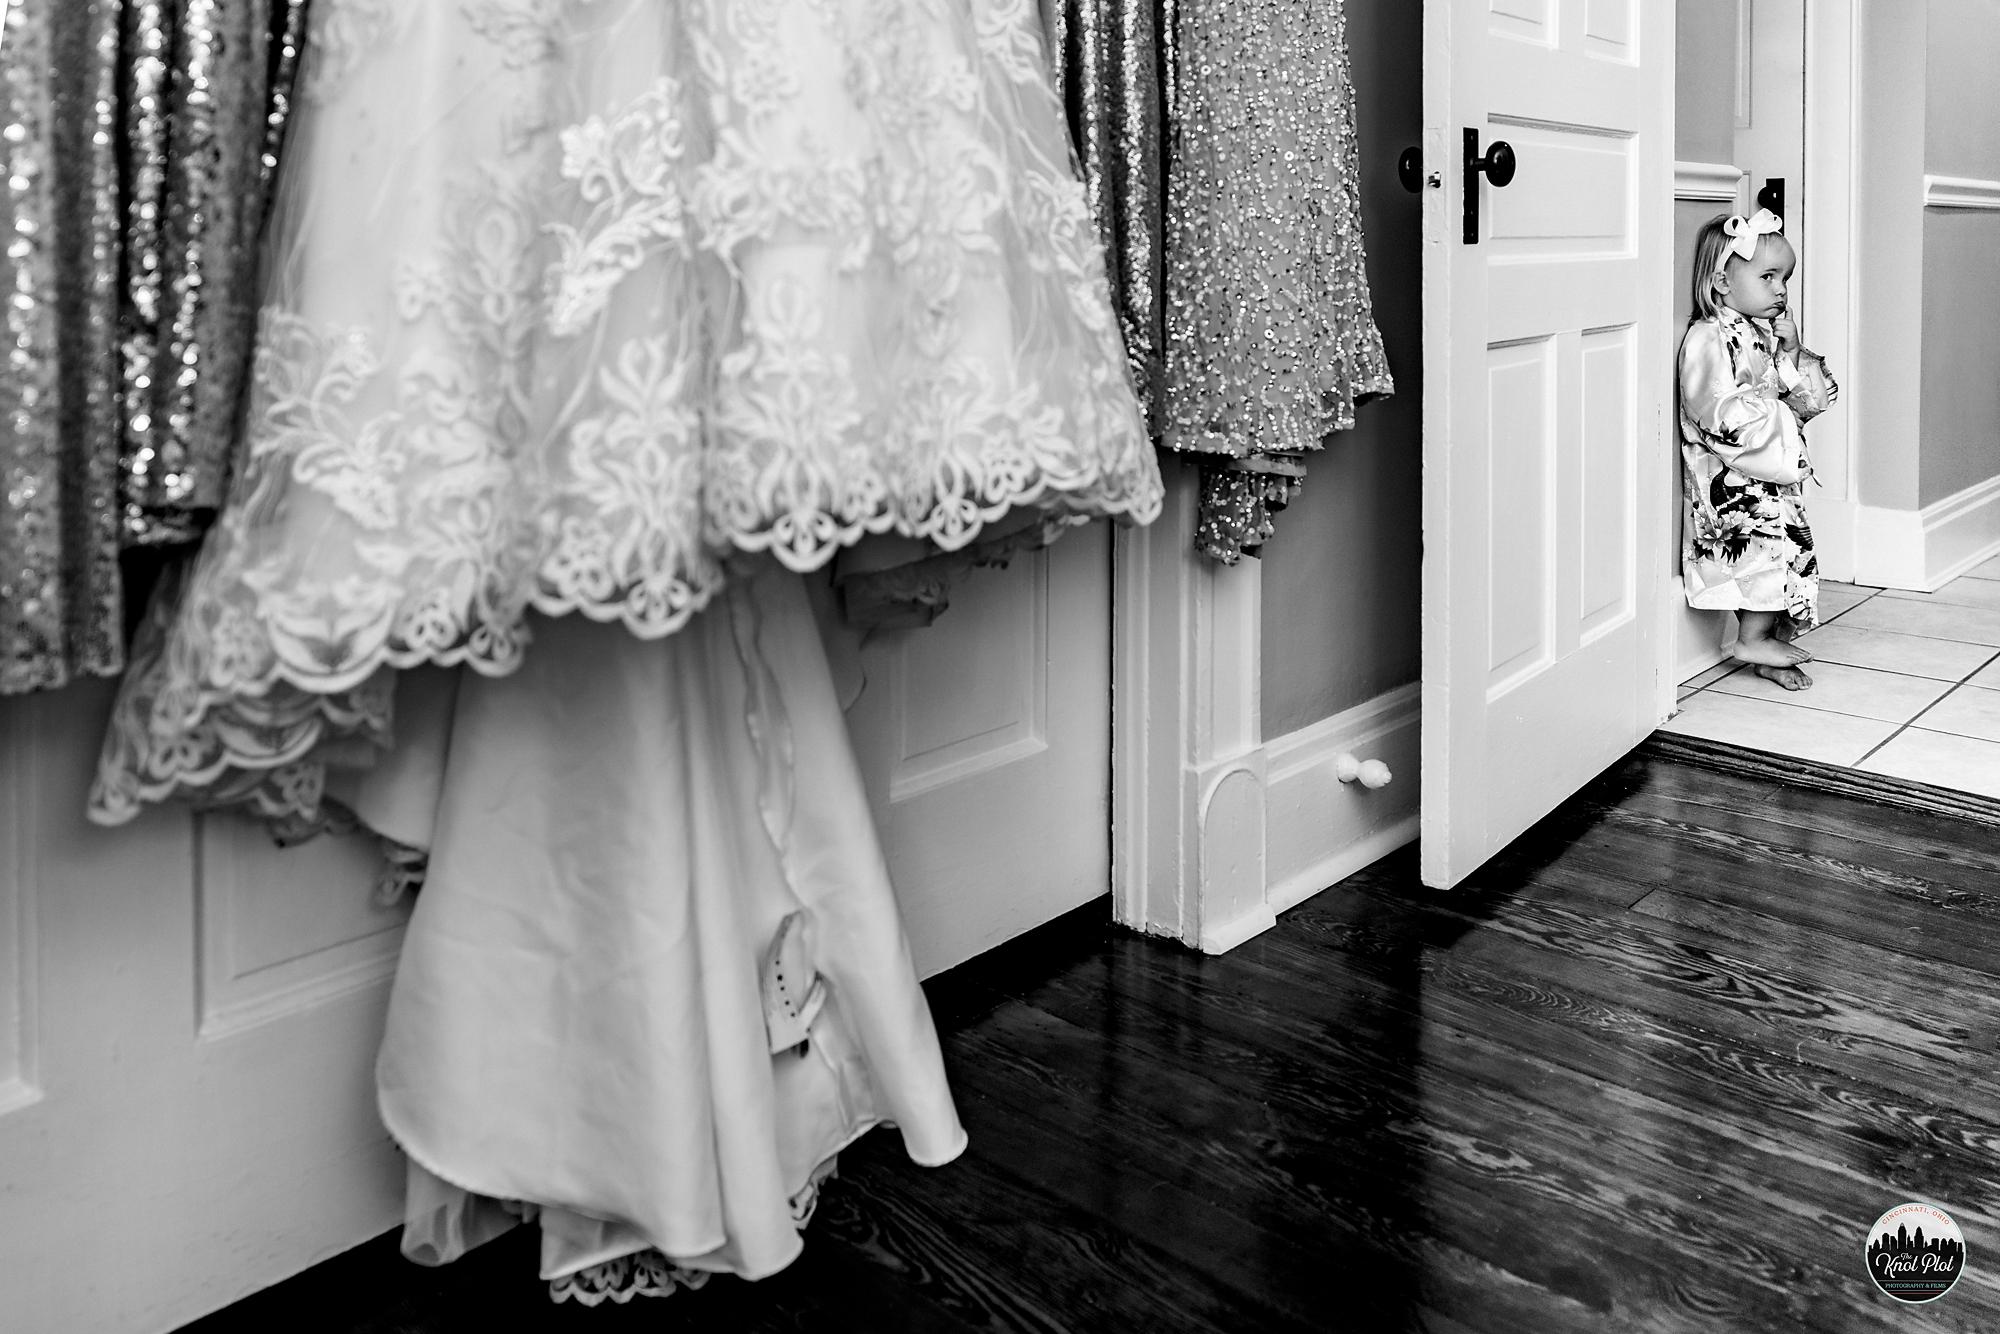 Southgate-Community-Center-KY-Wedding-Photography-6.jpg